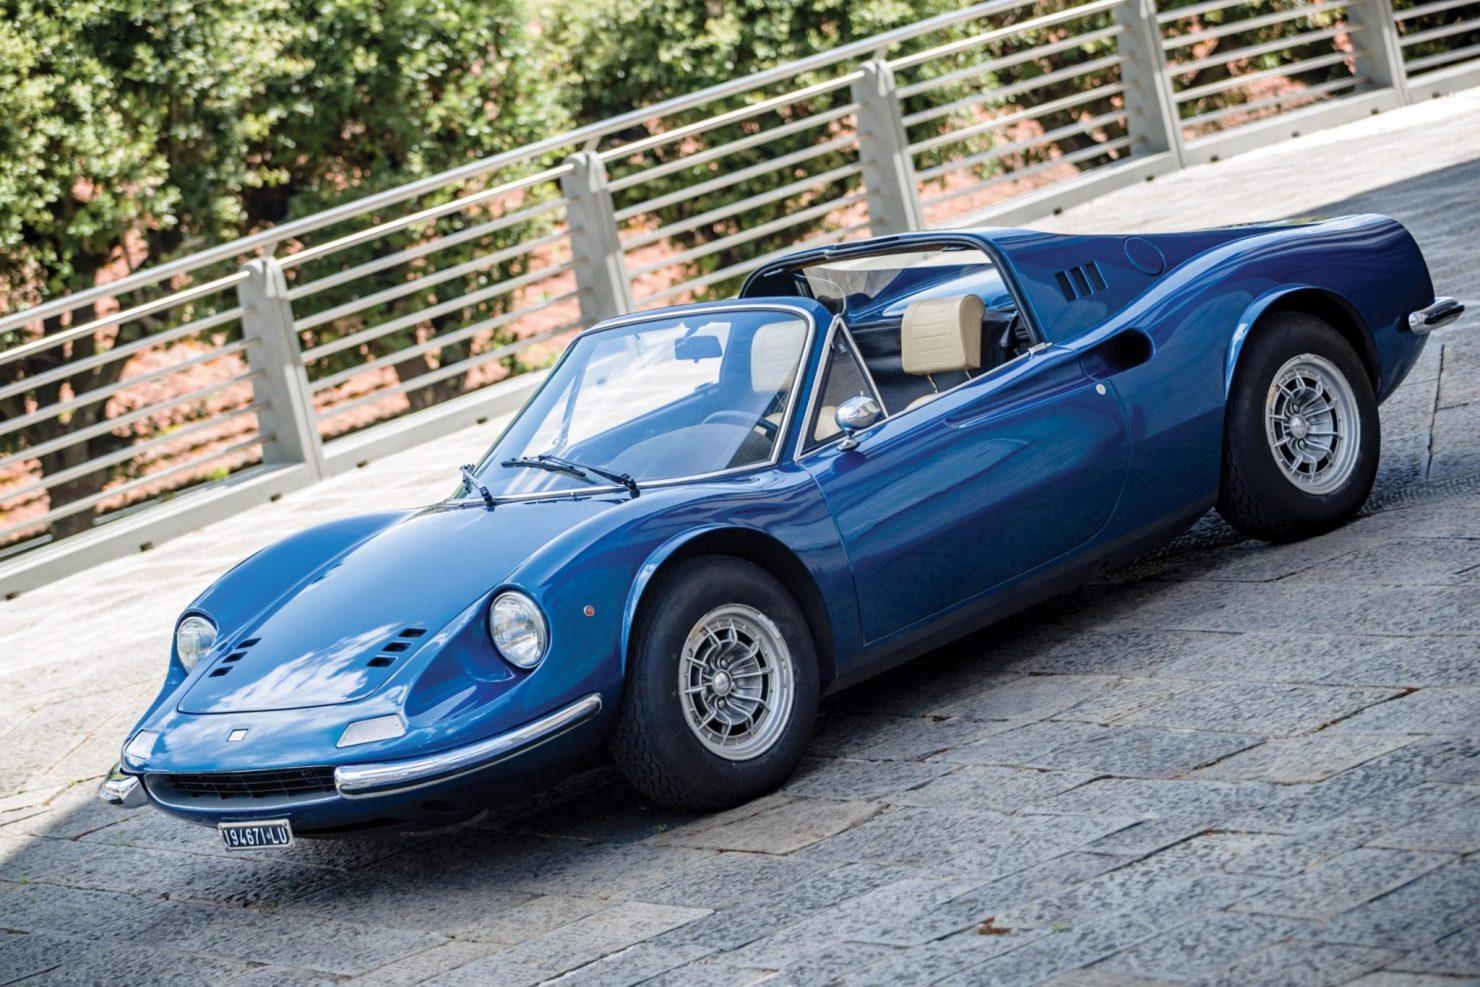 ferrari dino 246 gts car 19 1480x987 - 1973 Ferrari Dino 246 GTS